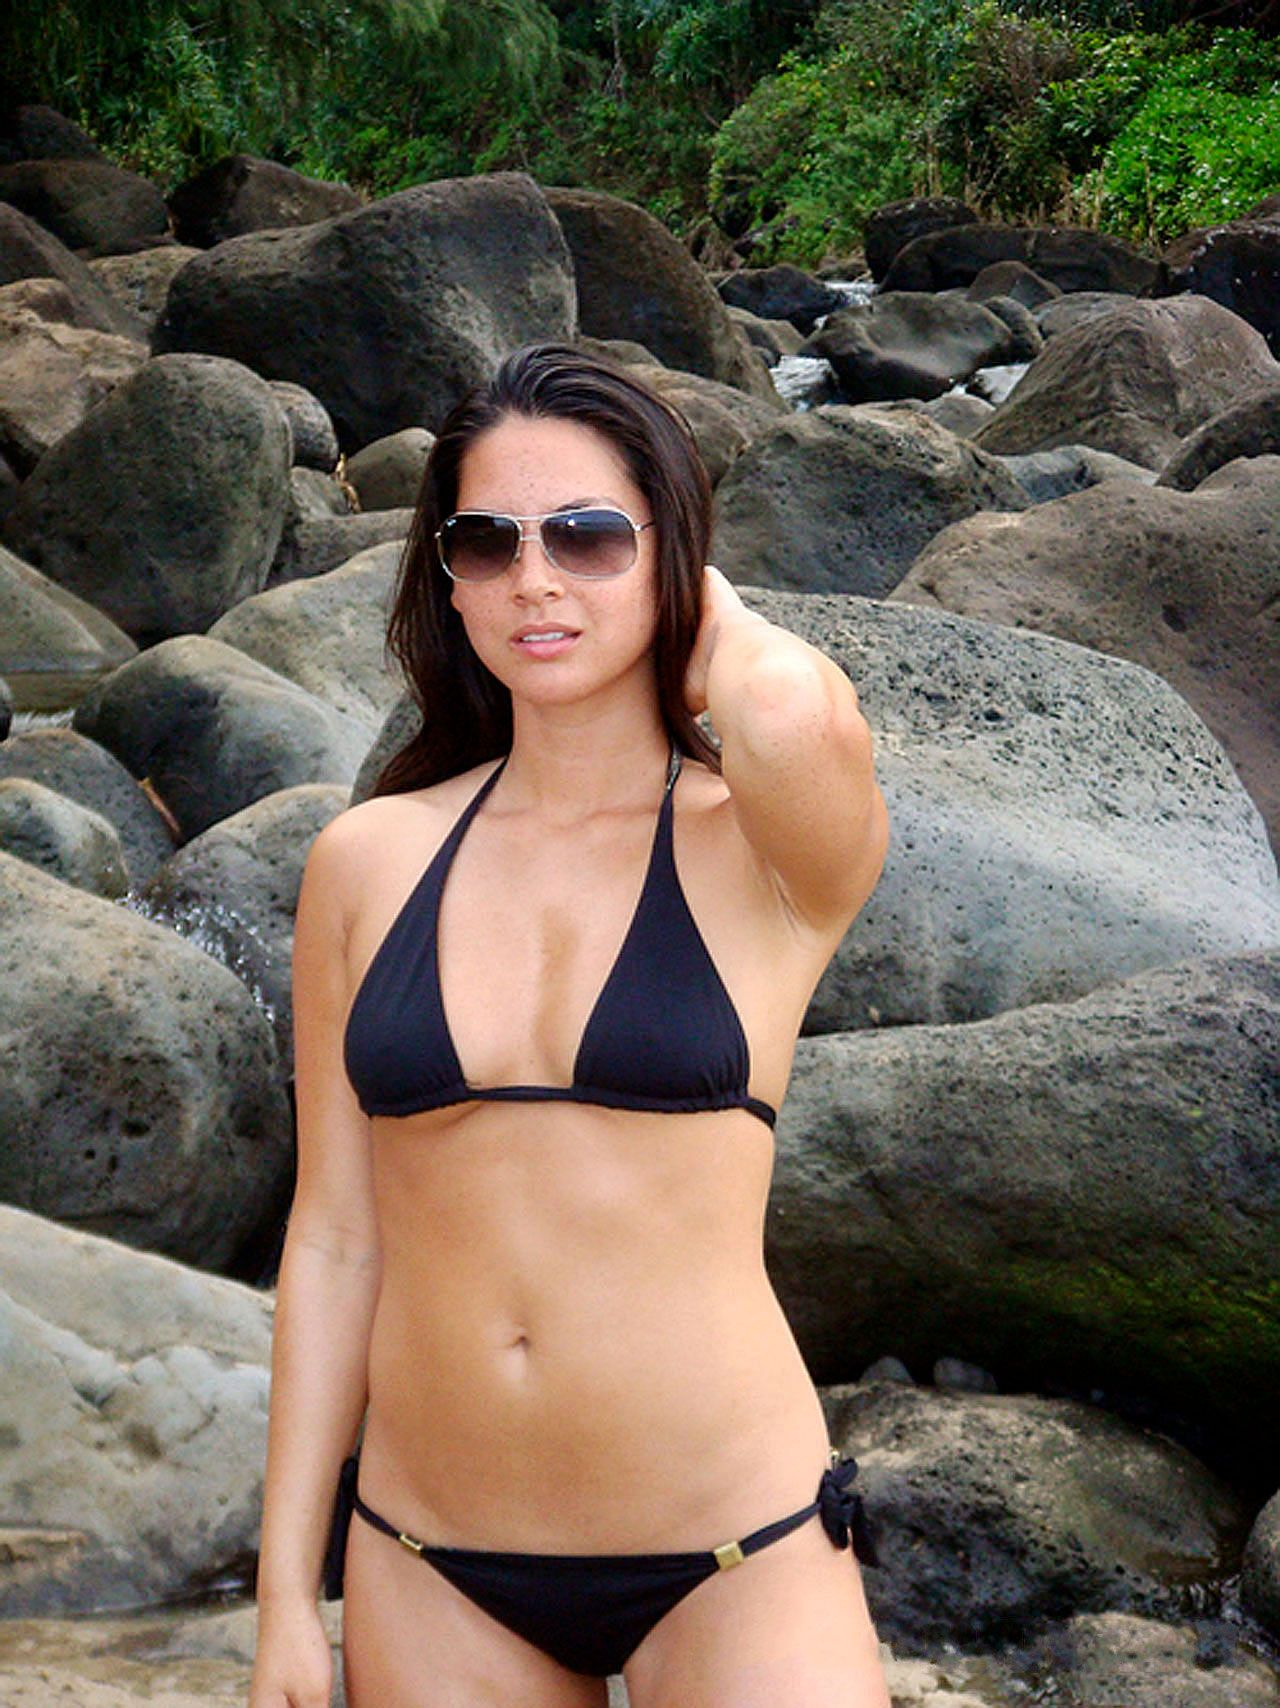 pictures Olivia munn bikini